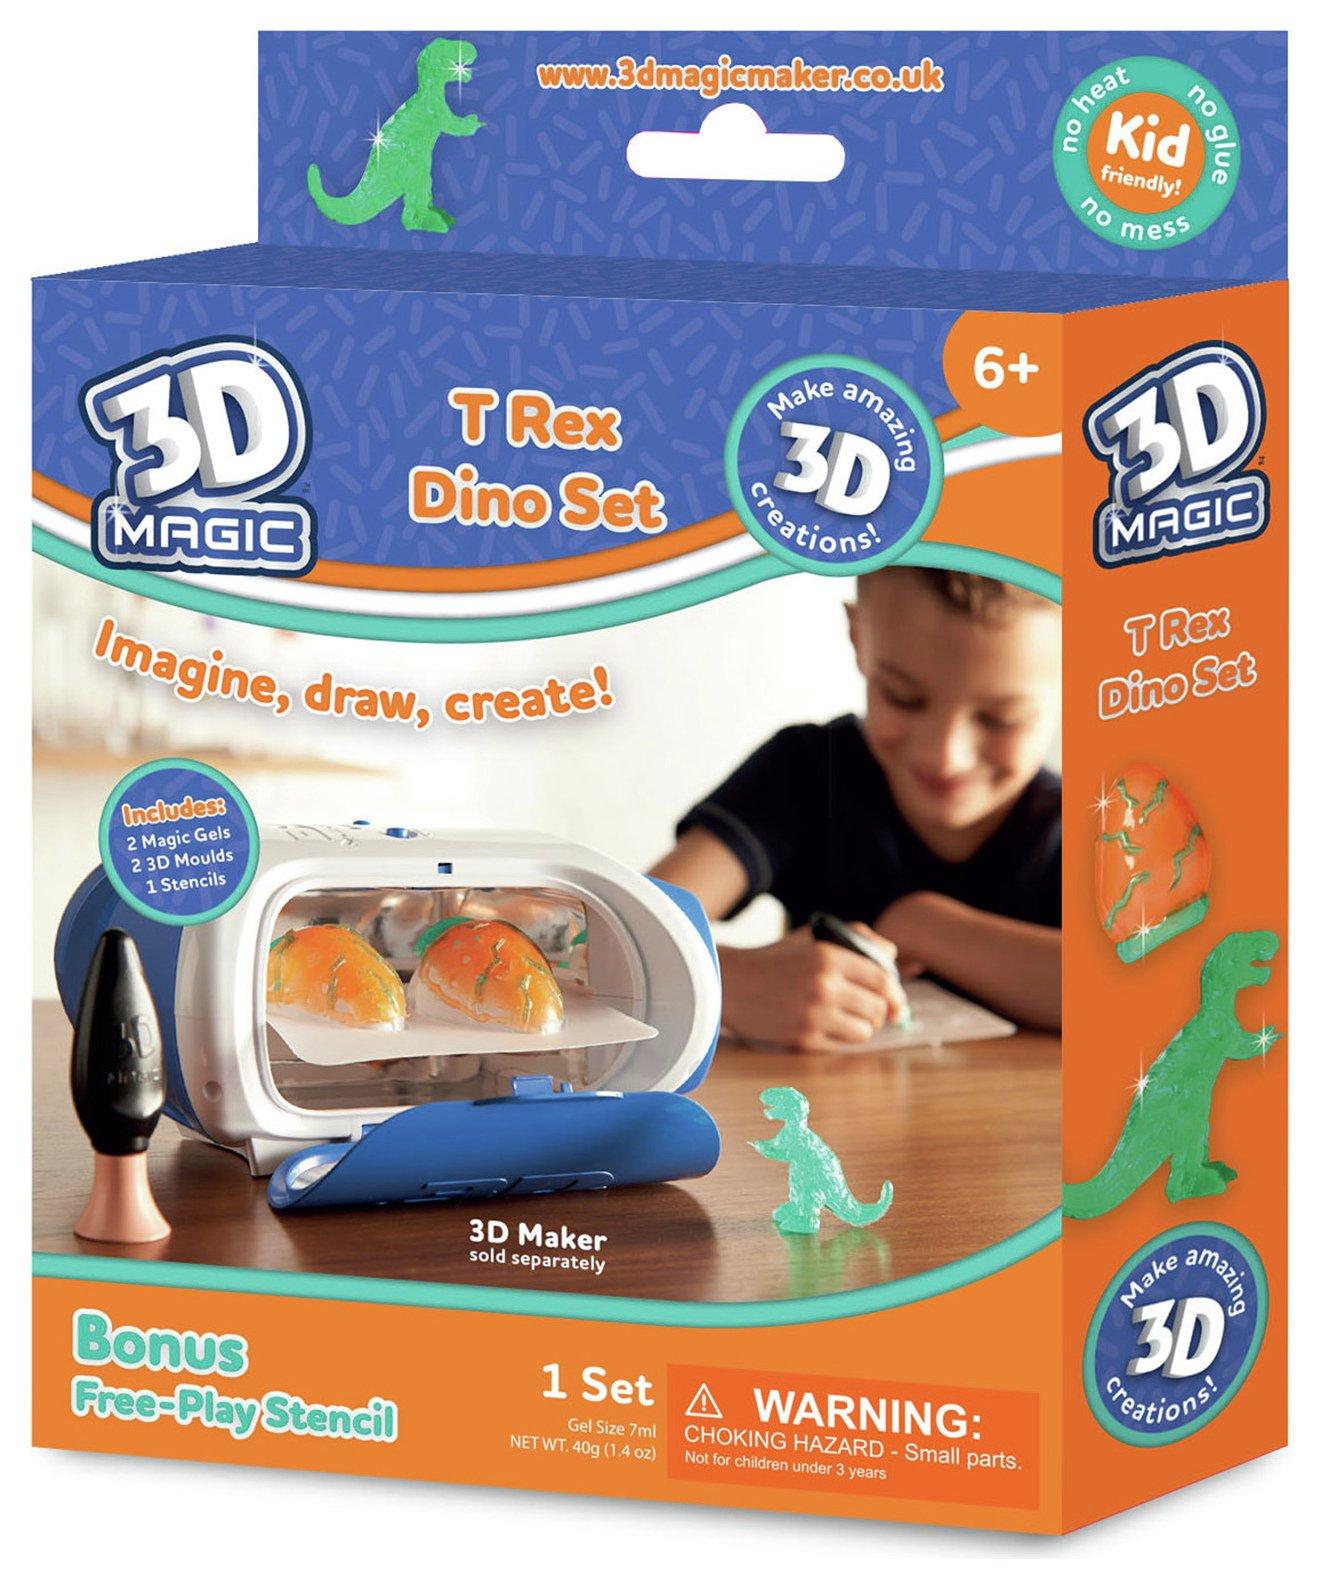 Image of 3D Maker T-Rex Dinosaur Set.